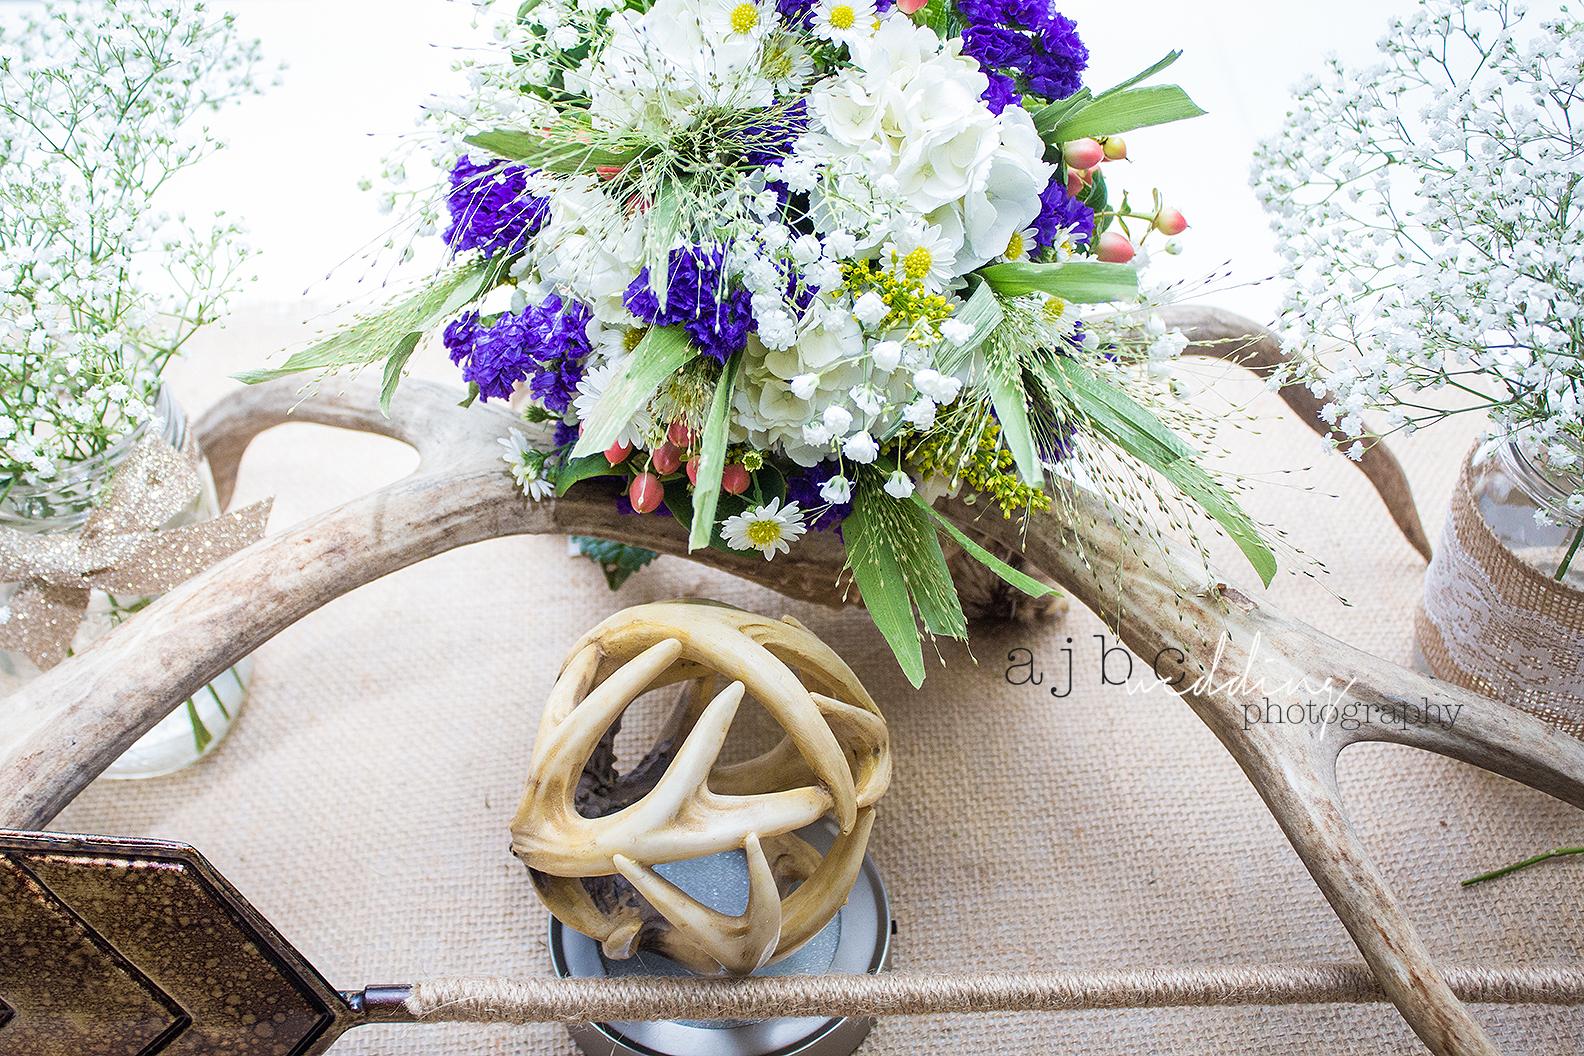 ajbcphotography-port-huron-michigan-wedding-photographer-outdoors-summer-wedding-country-wedding-wadhams-michigan-bride-vintage-wedding2.jpg